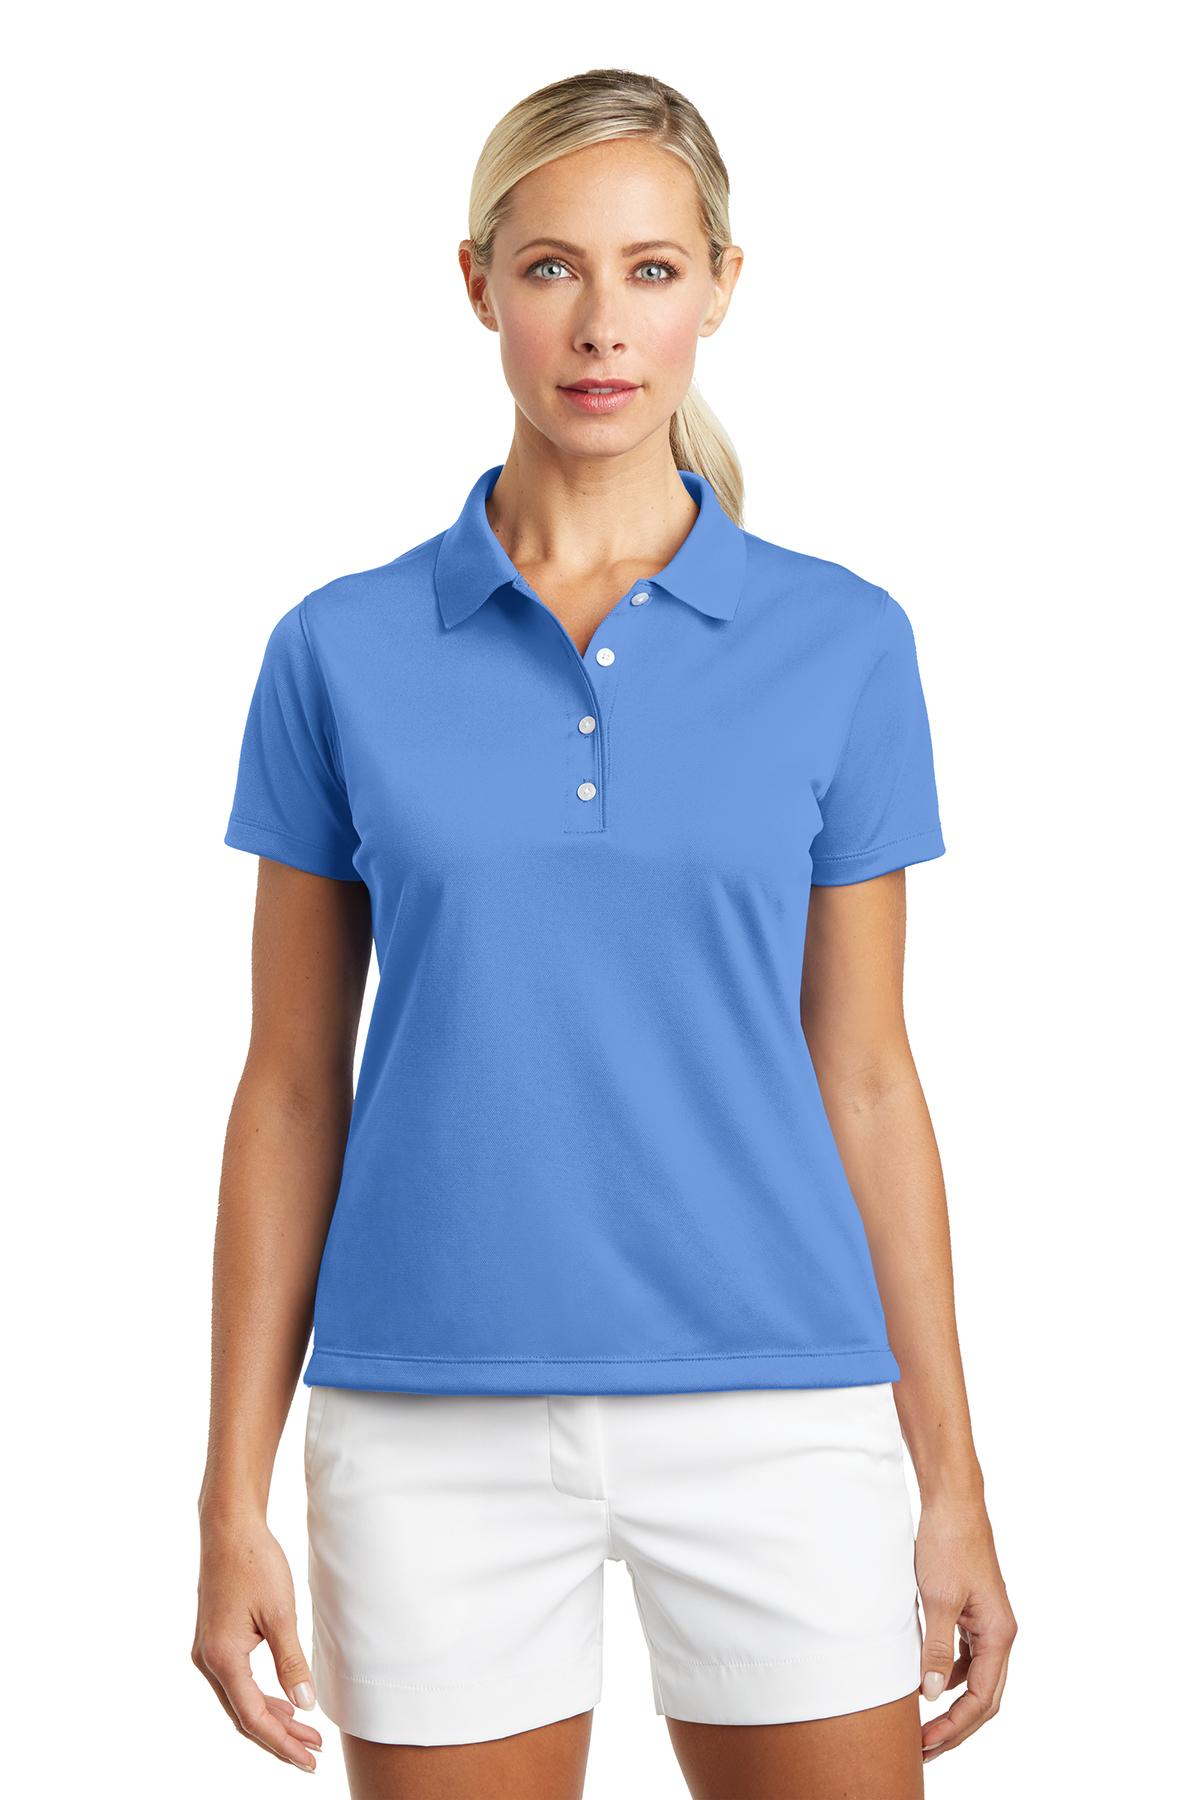 24b2317b Nike Ladies Tech Basic Dri-FIT Polo | Ladies/Women | Polos/Knits ...